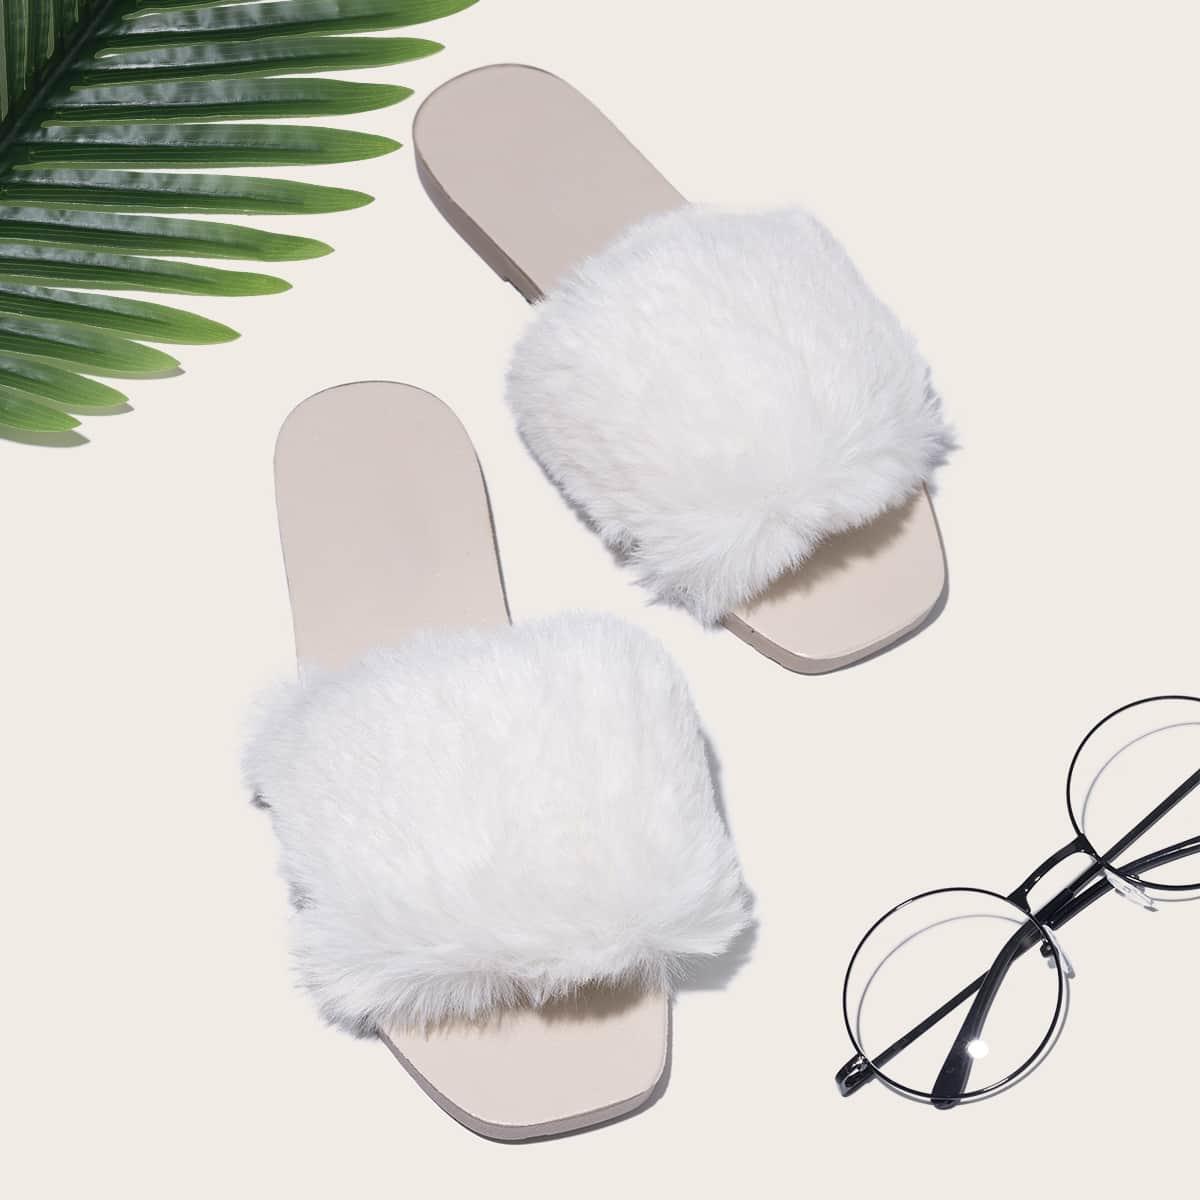 SHEIN / Open Toe Fluffy Decor Slippers